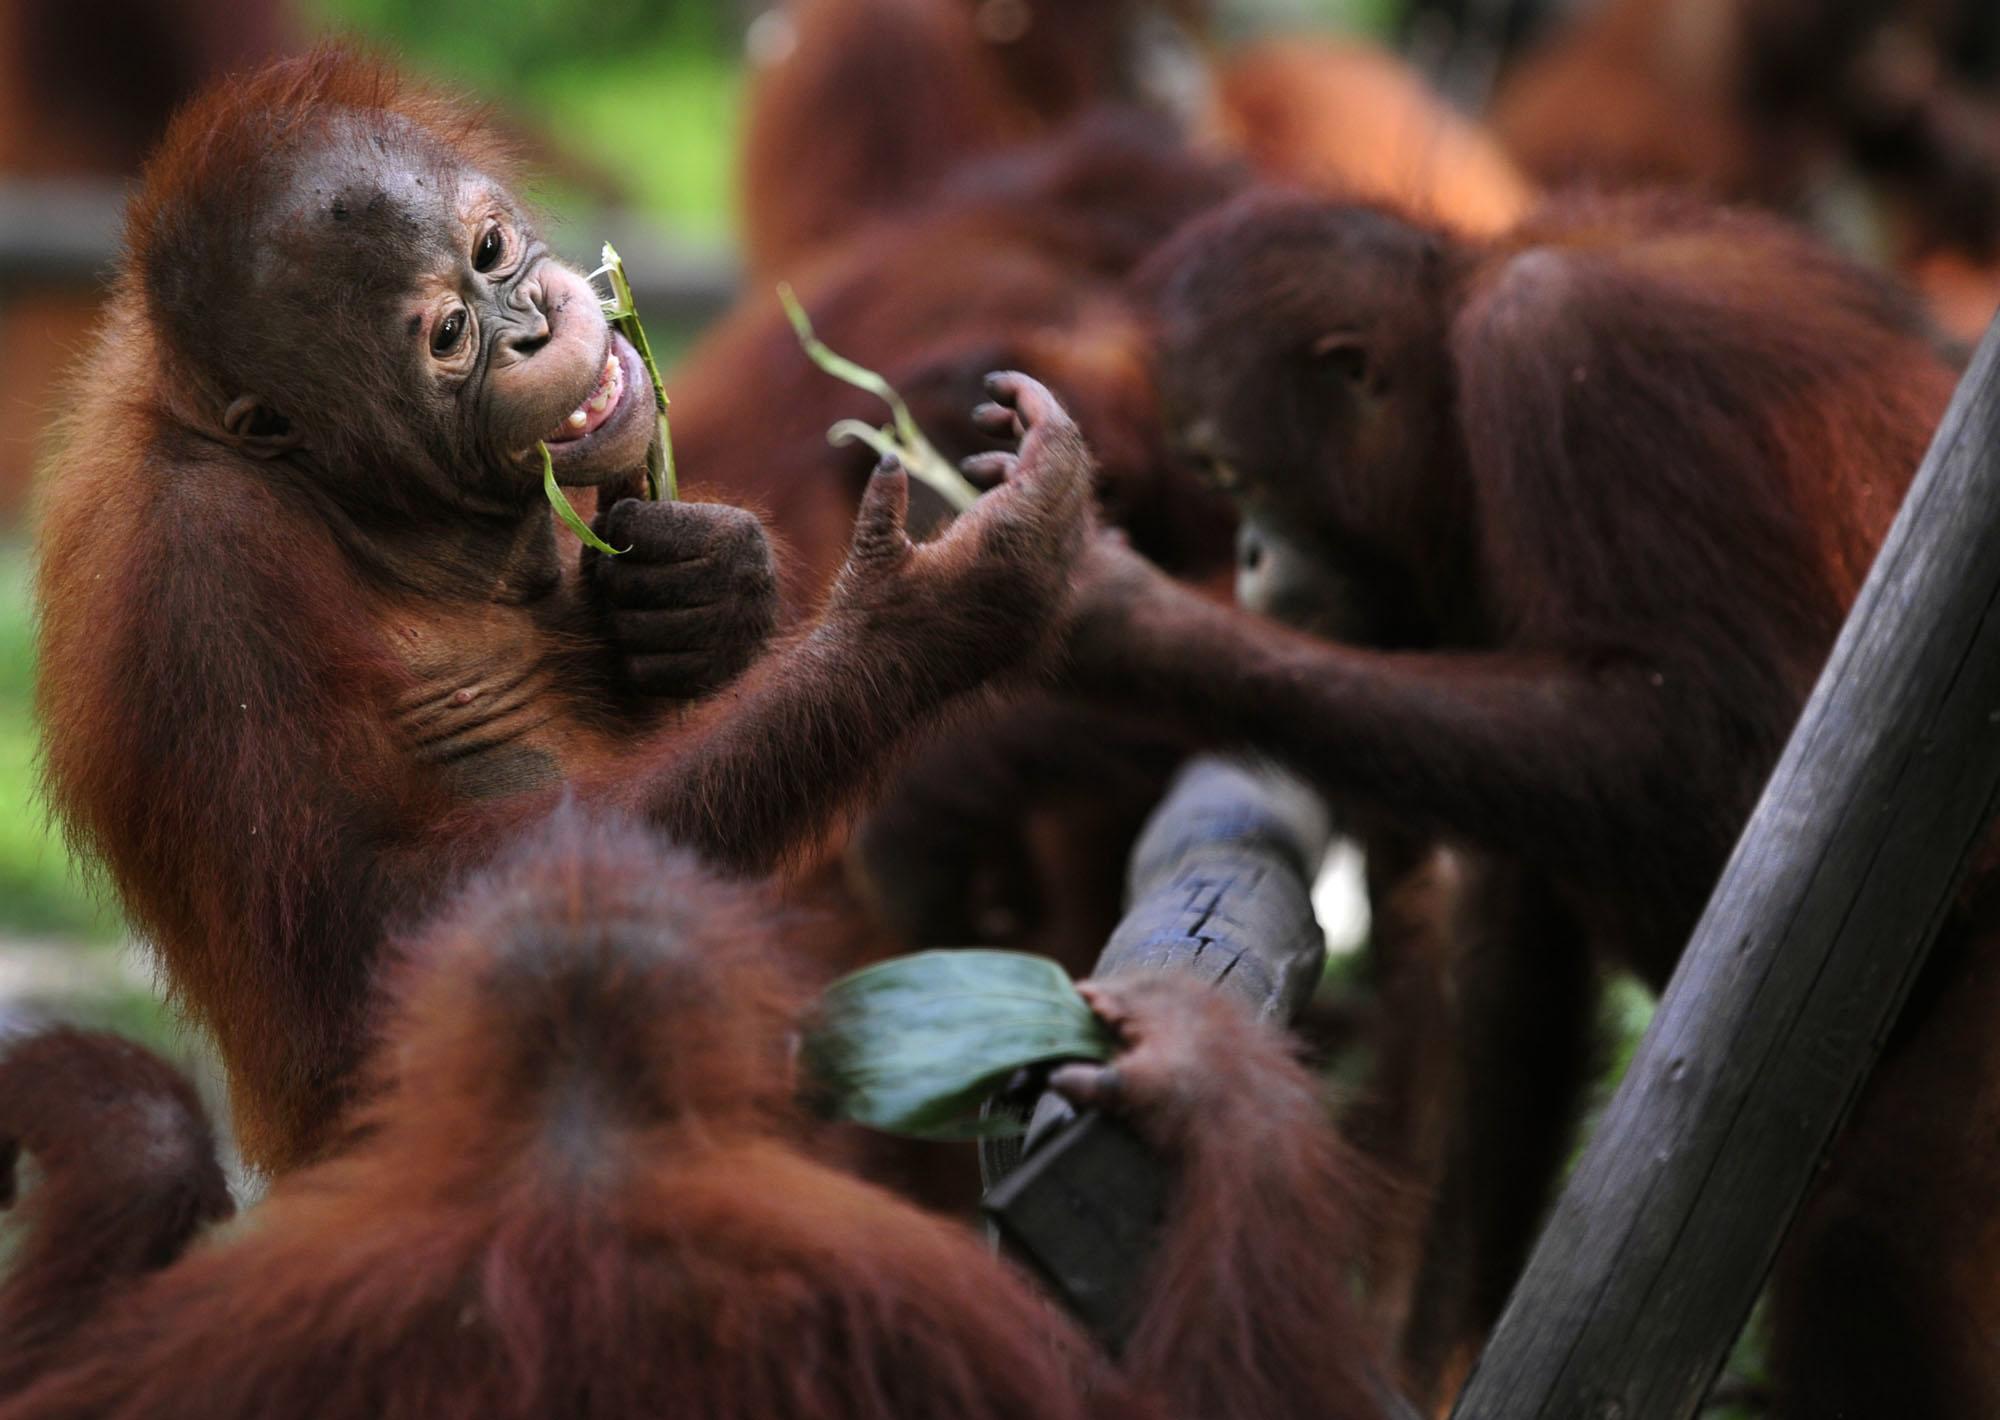 Orangutans make music with kazoos